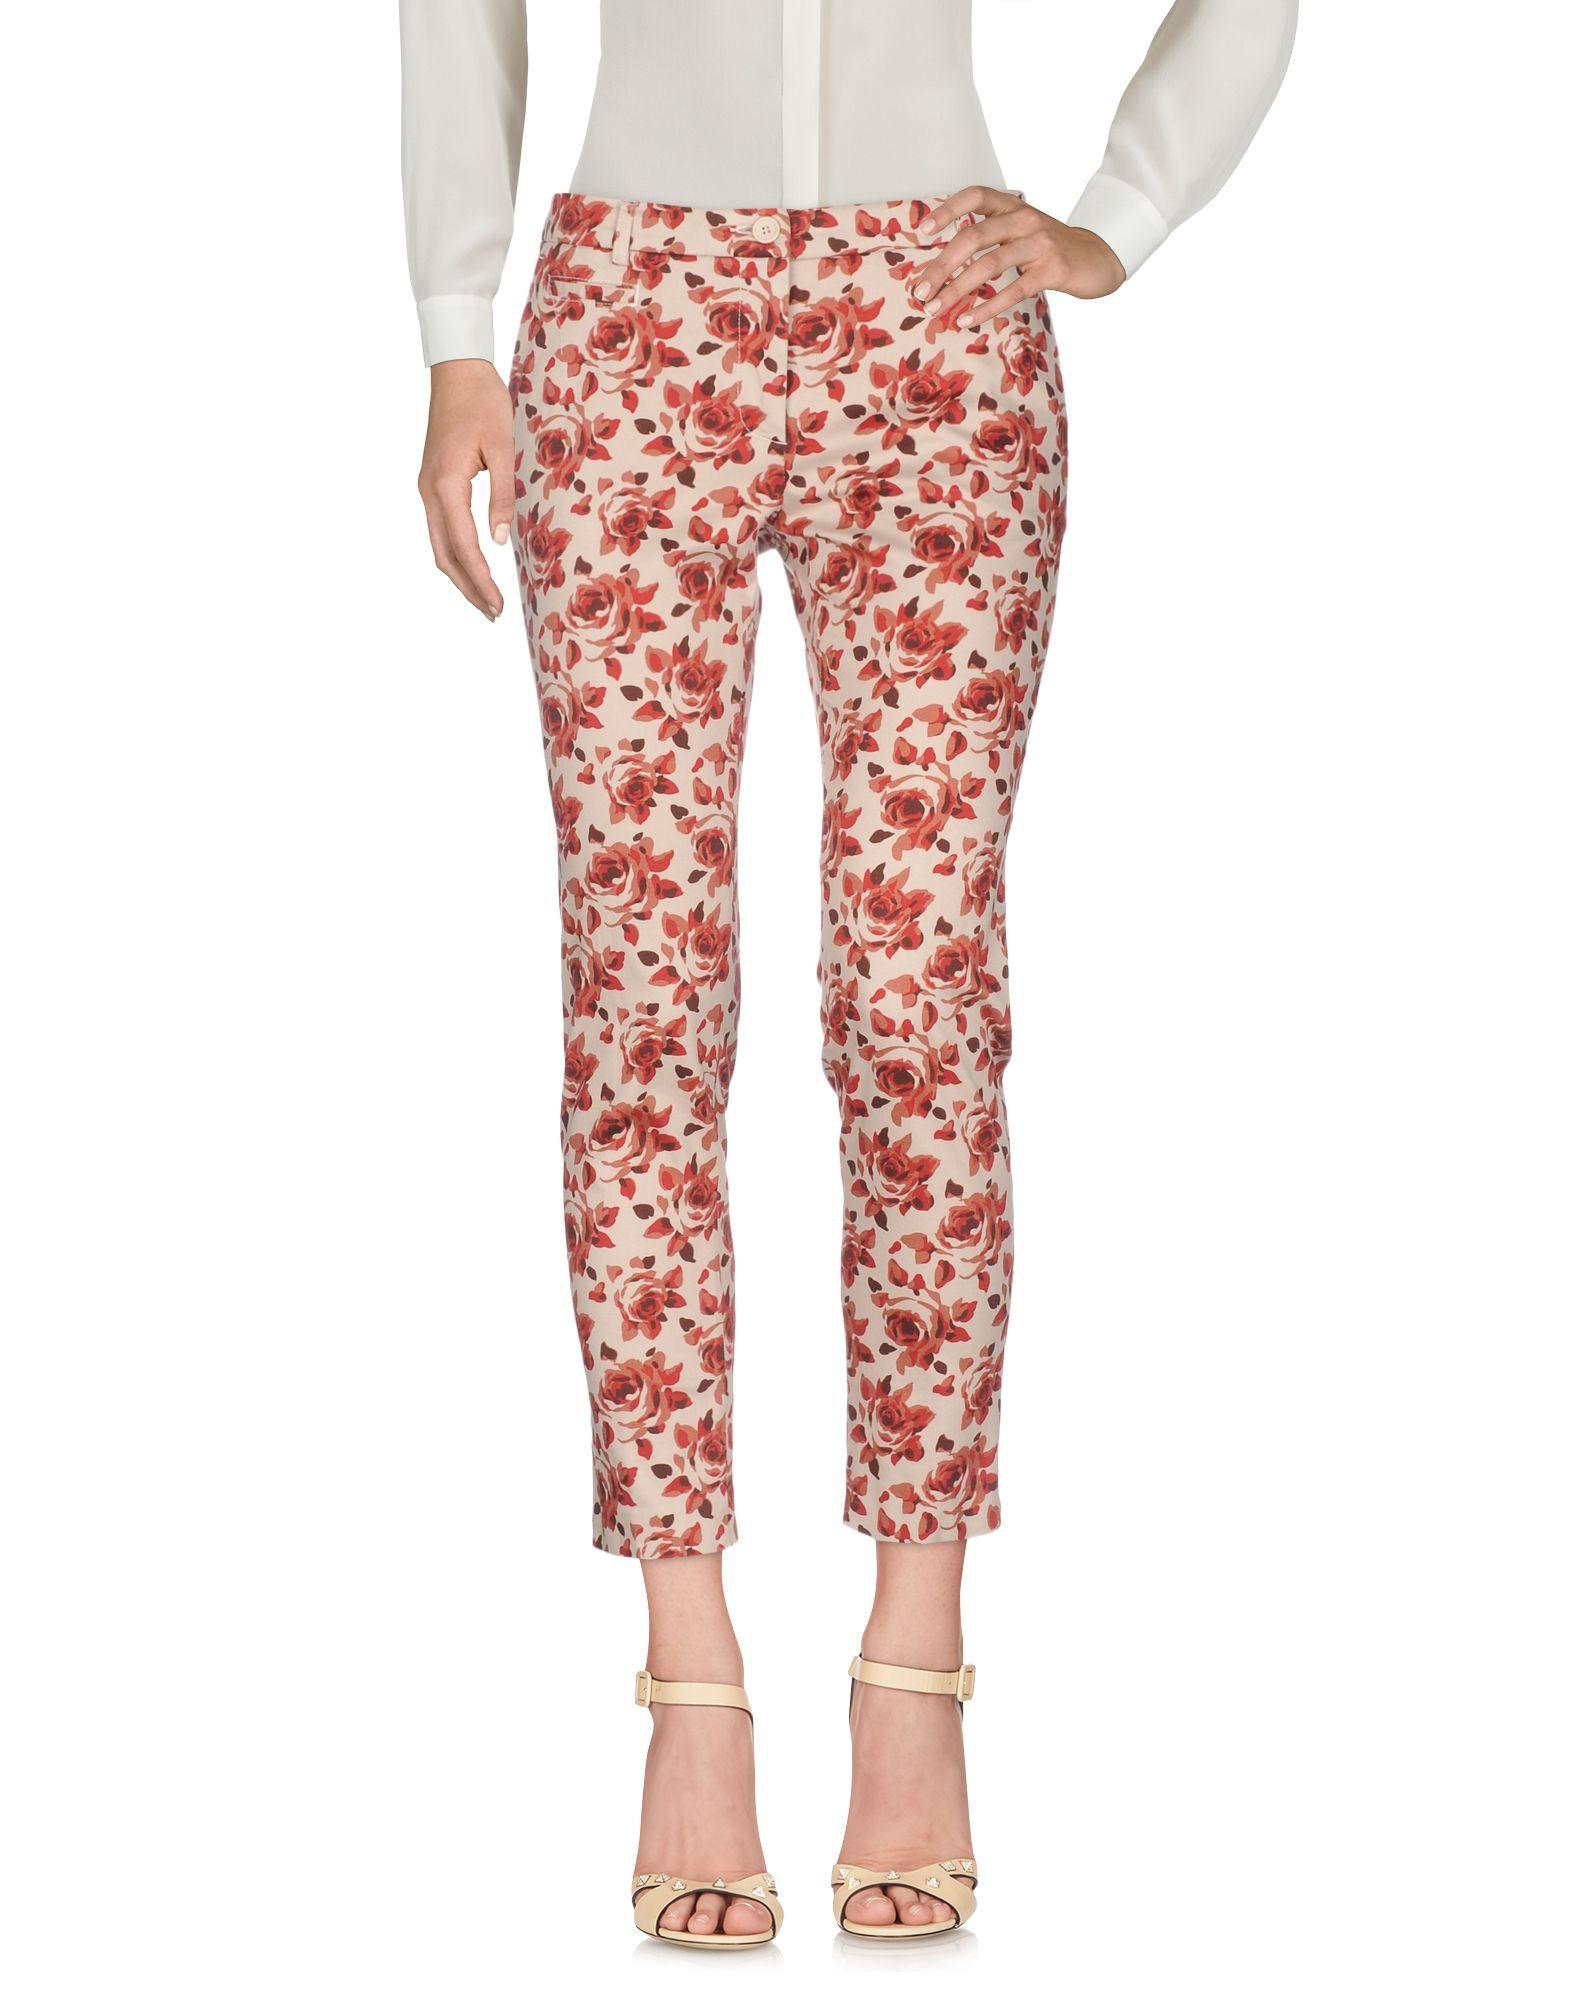 Pantalone Pantalone Pantalone P One donna - 13123718LI 098